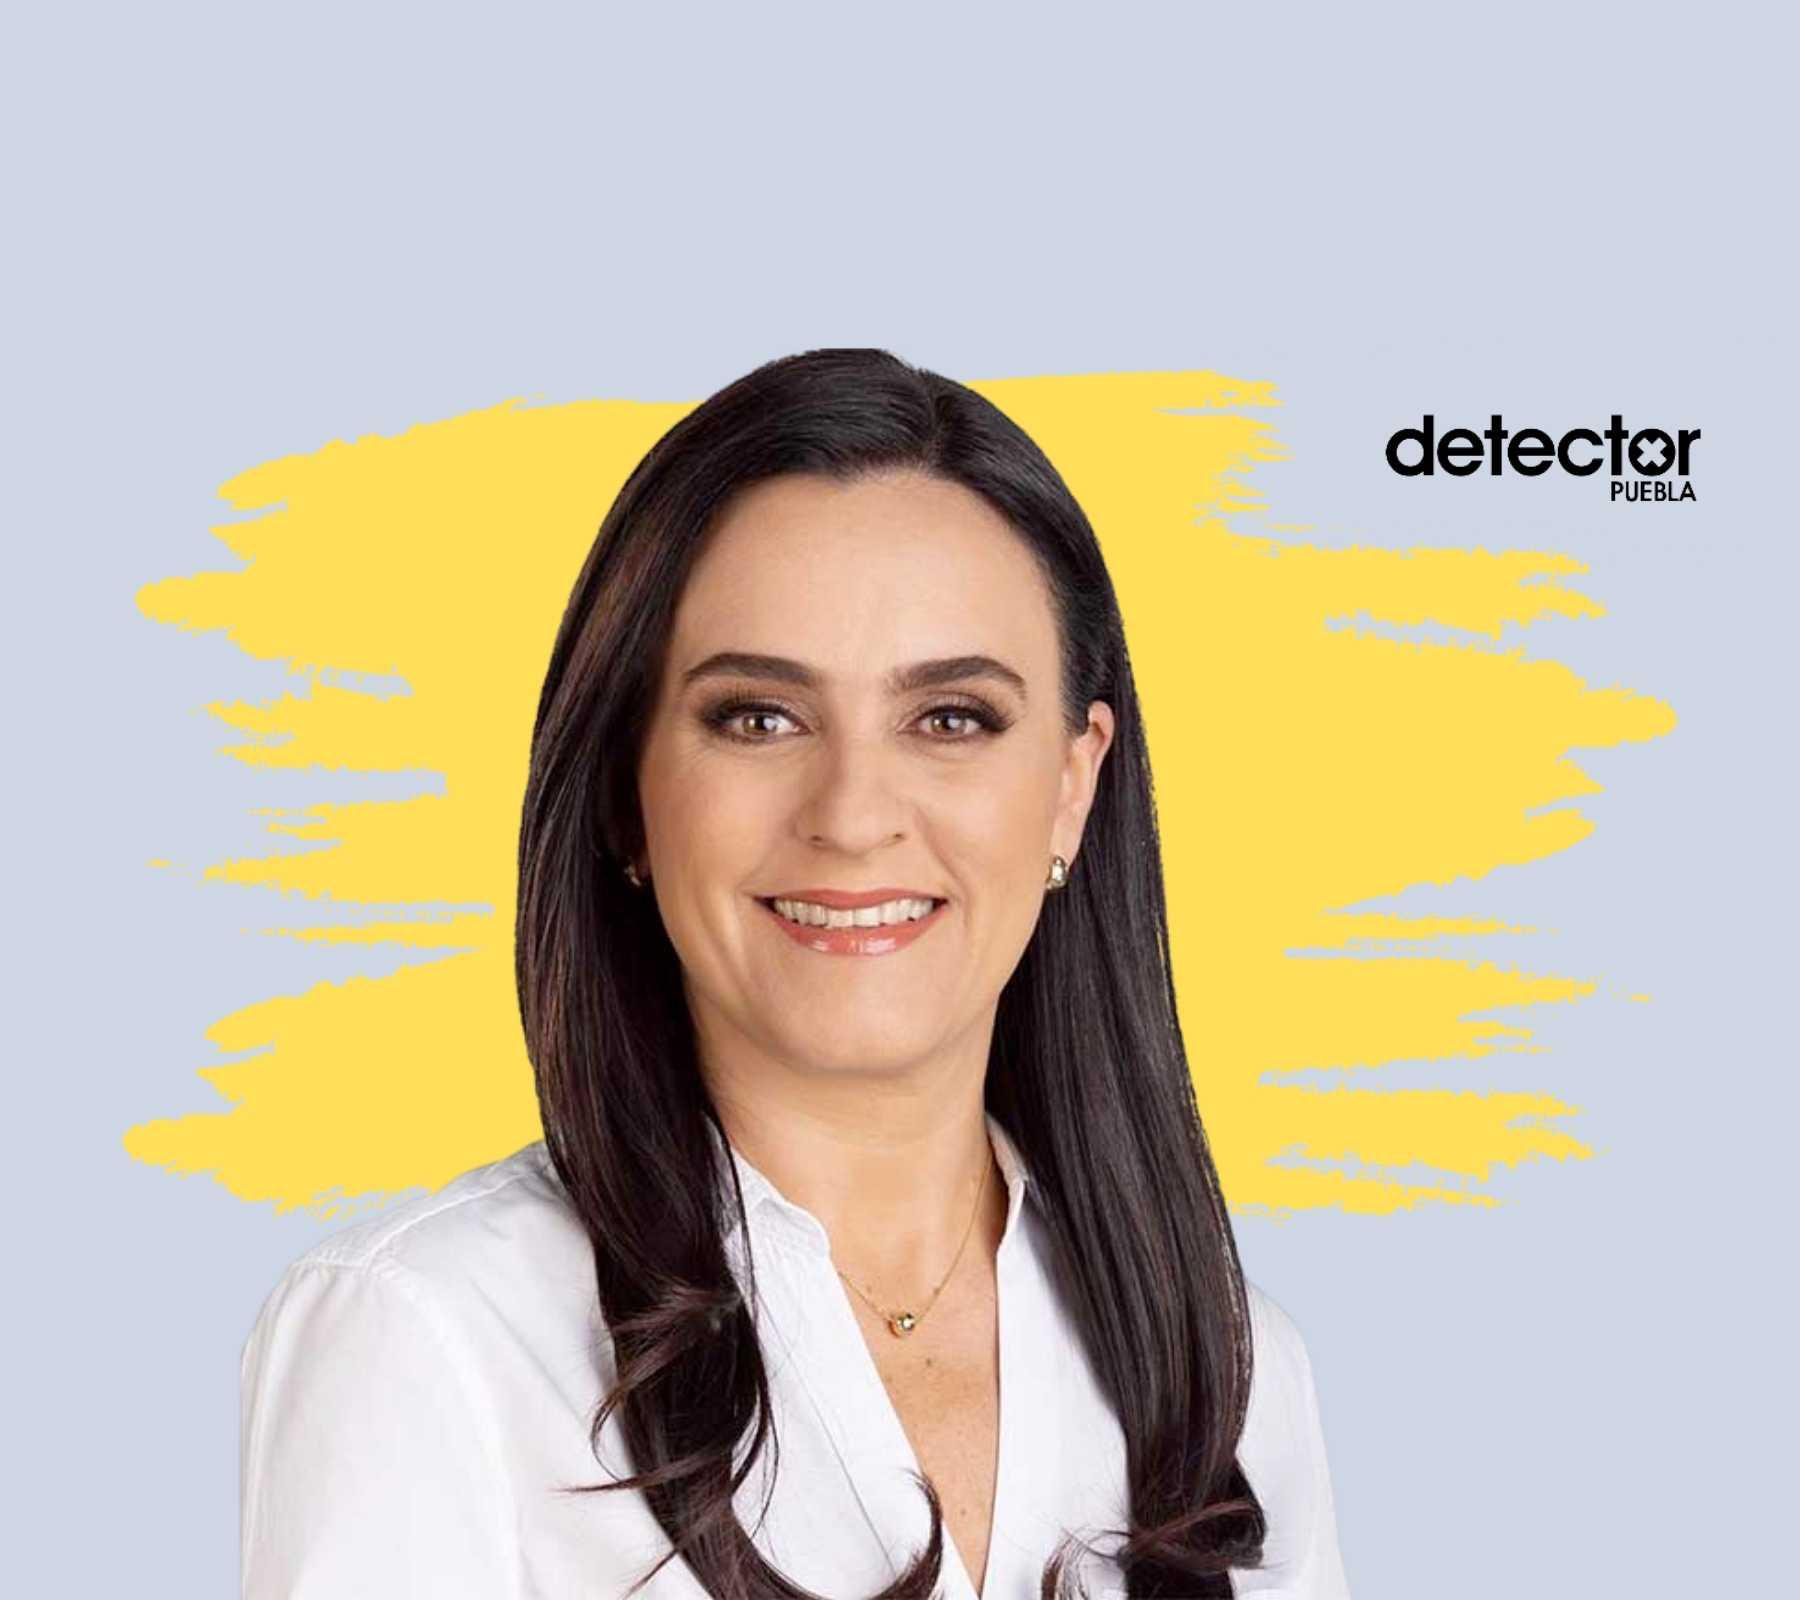 Mónica Rodríguez fotomultas detector